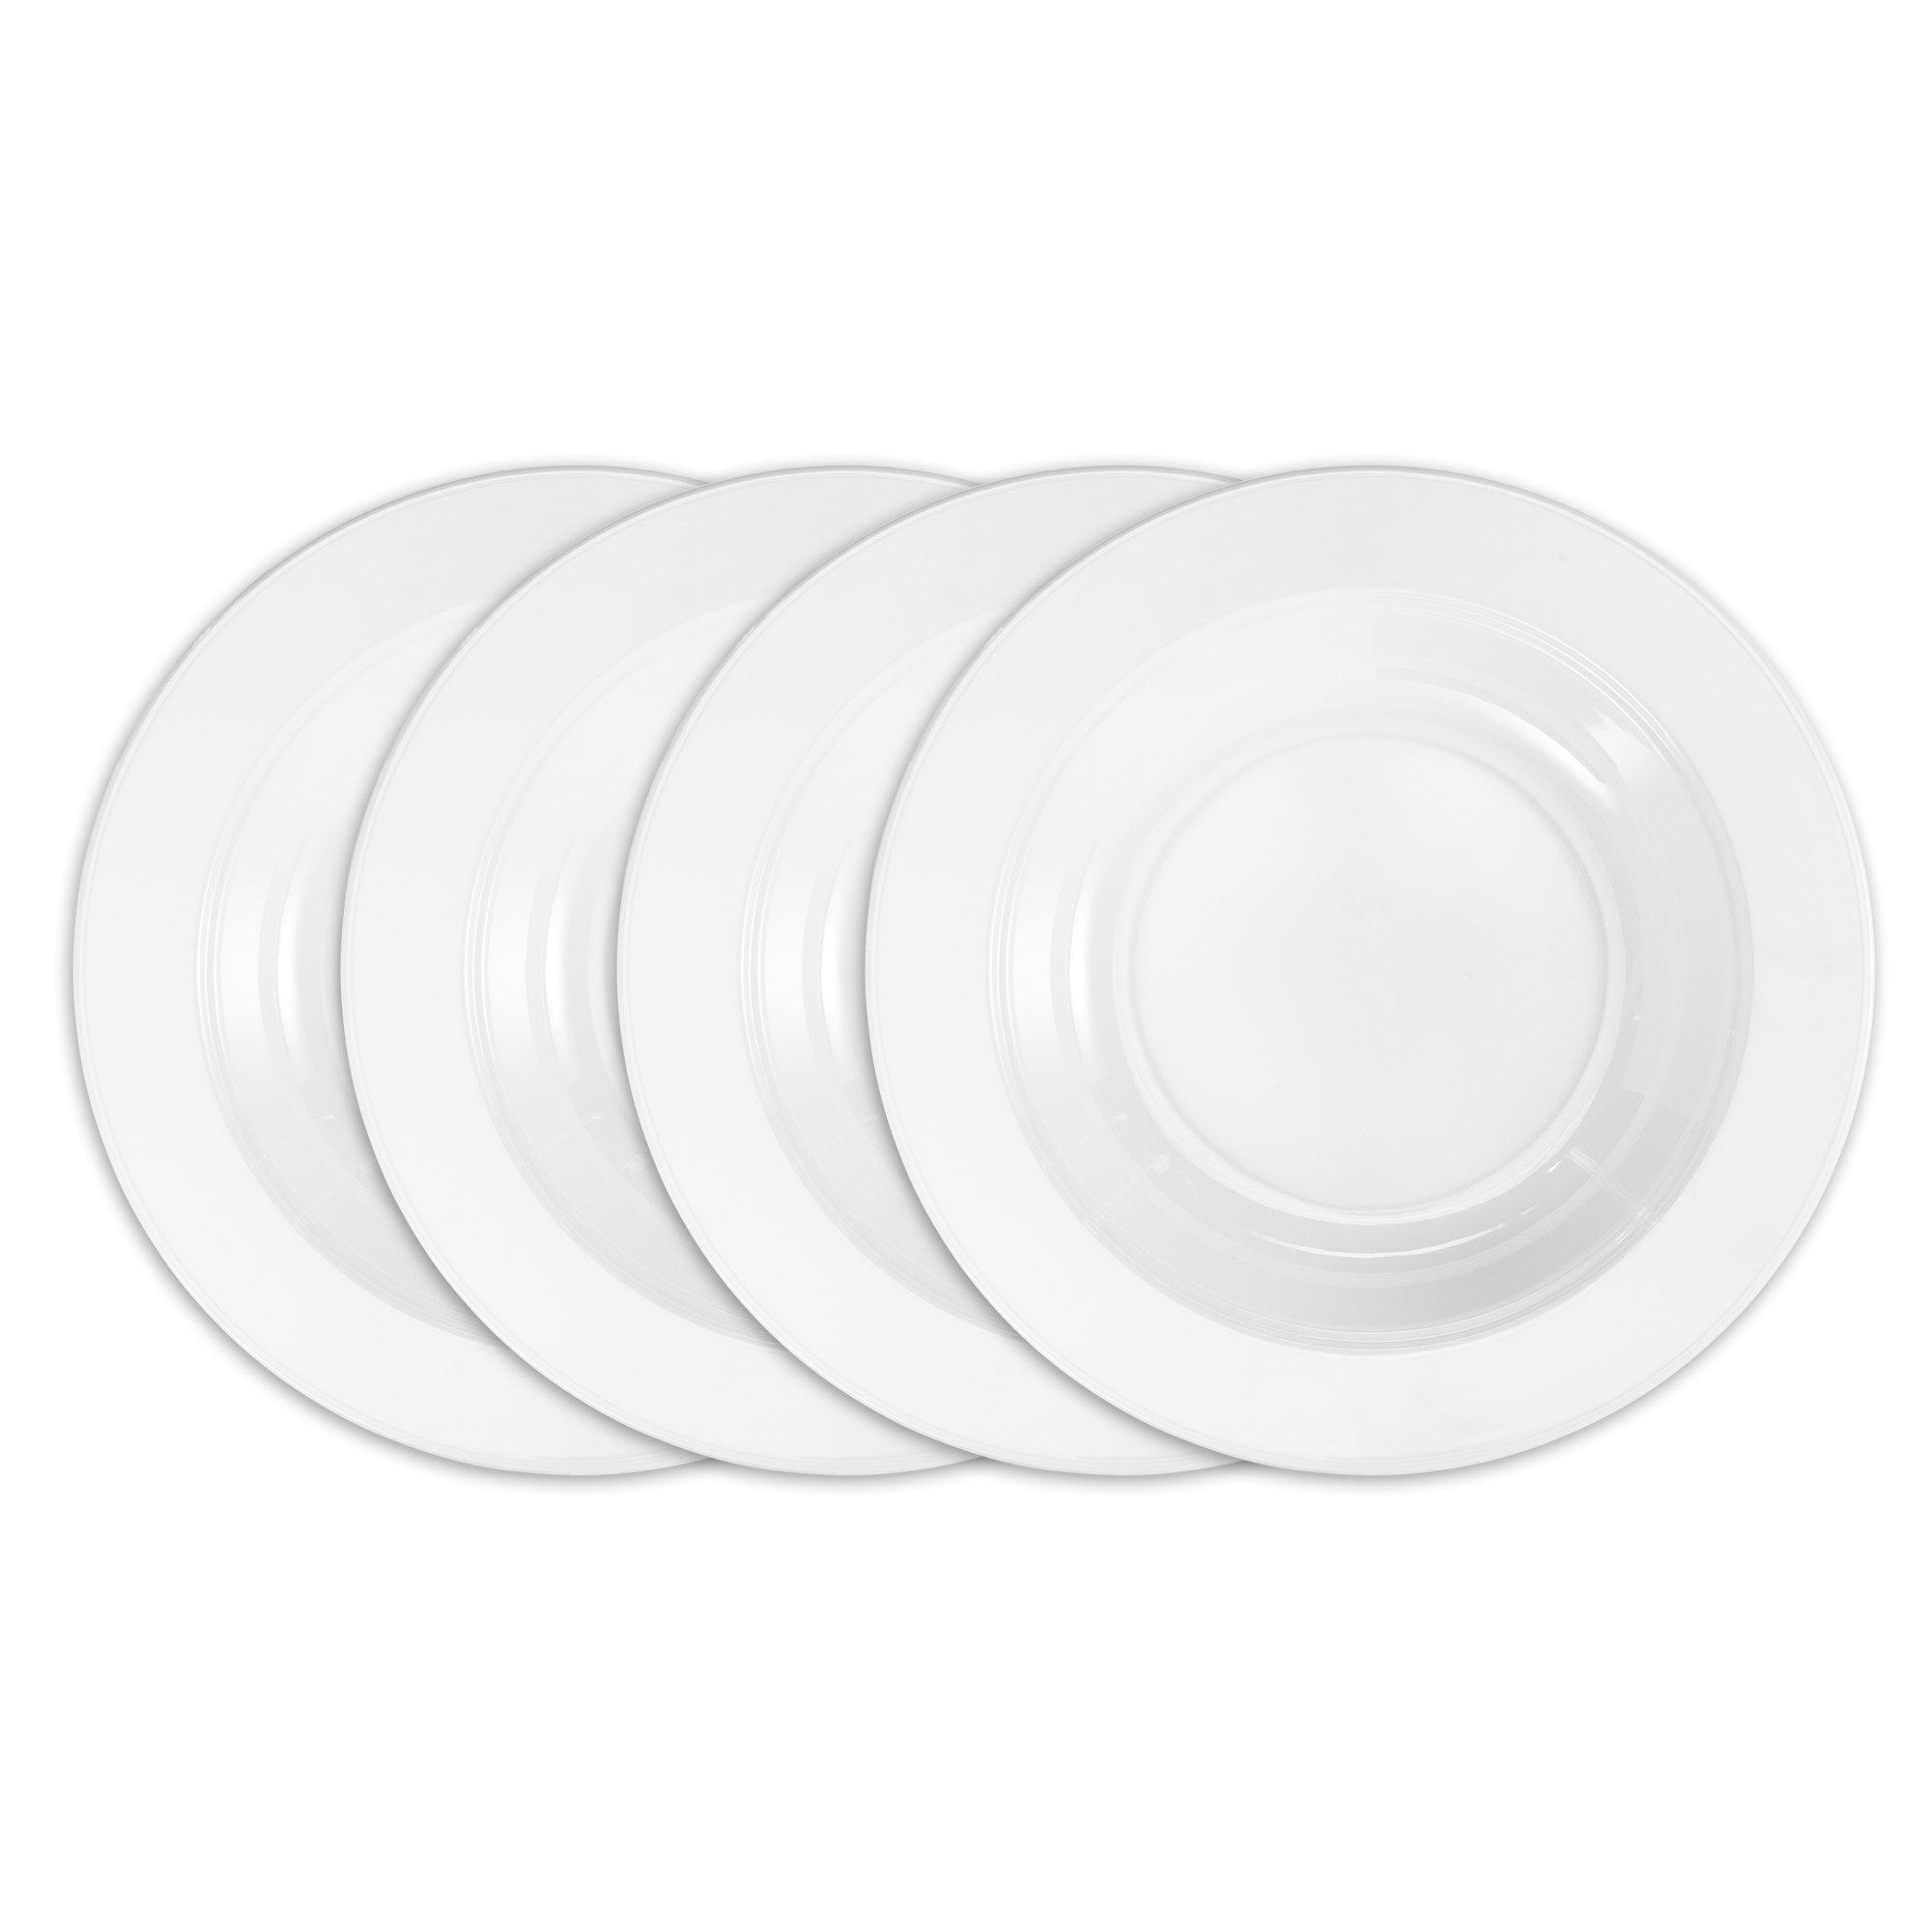 Q Squared Diamond BPA-Free and Shatterproof Melamine Round Pasta Bowl, 10-1/2-Inches, Set of 4, White